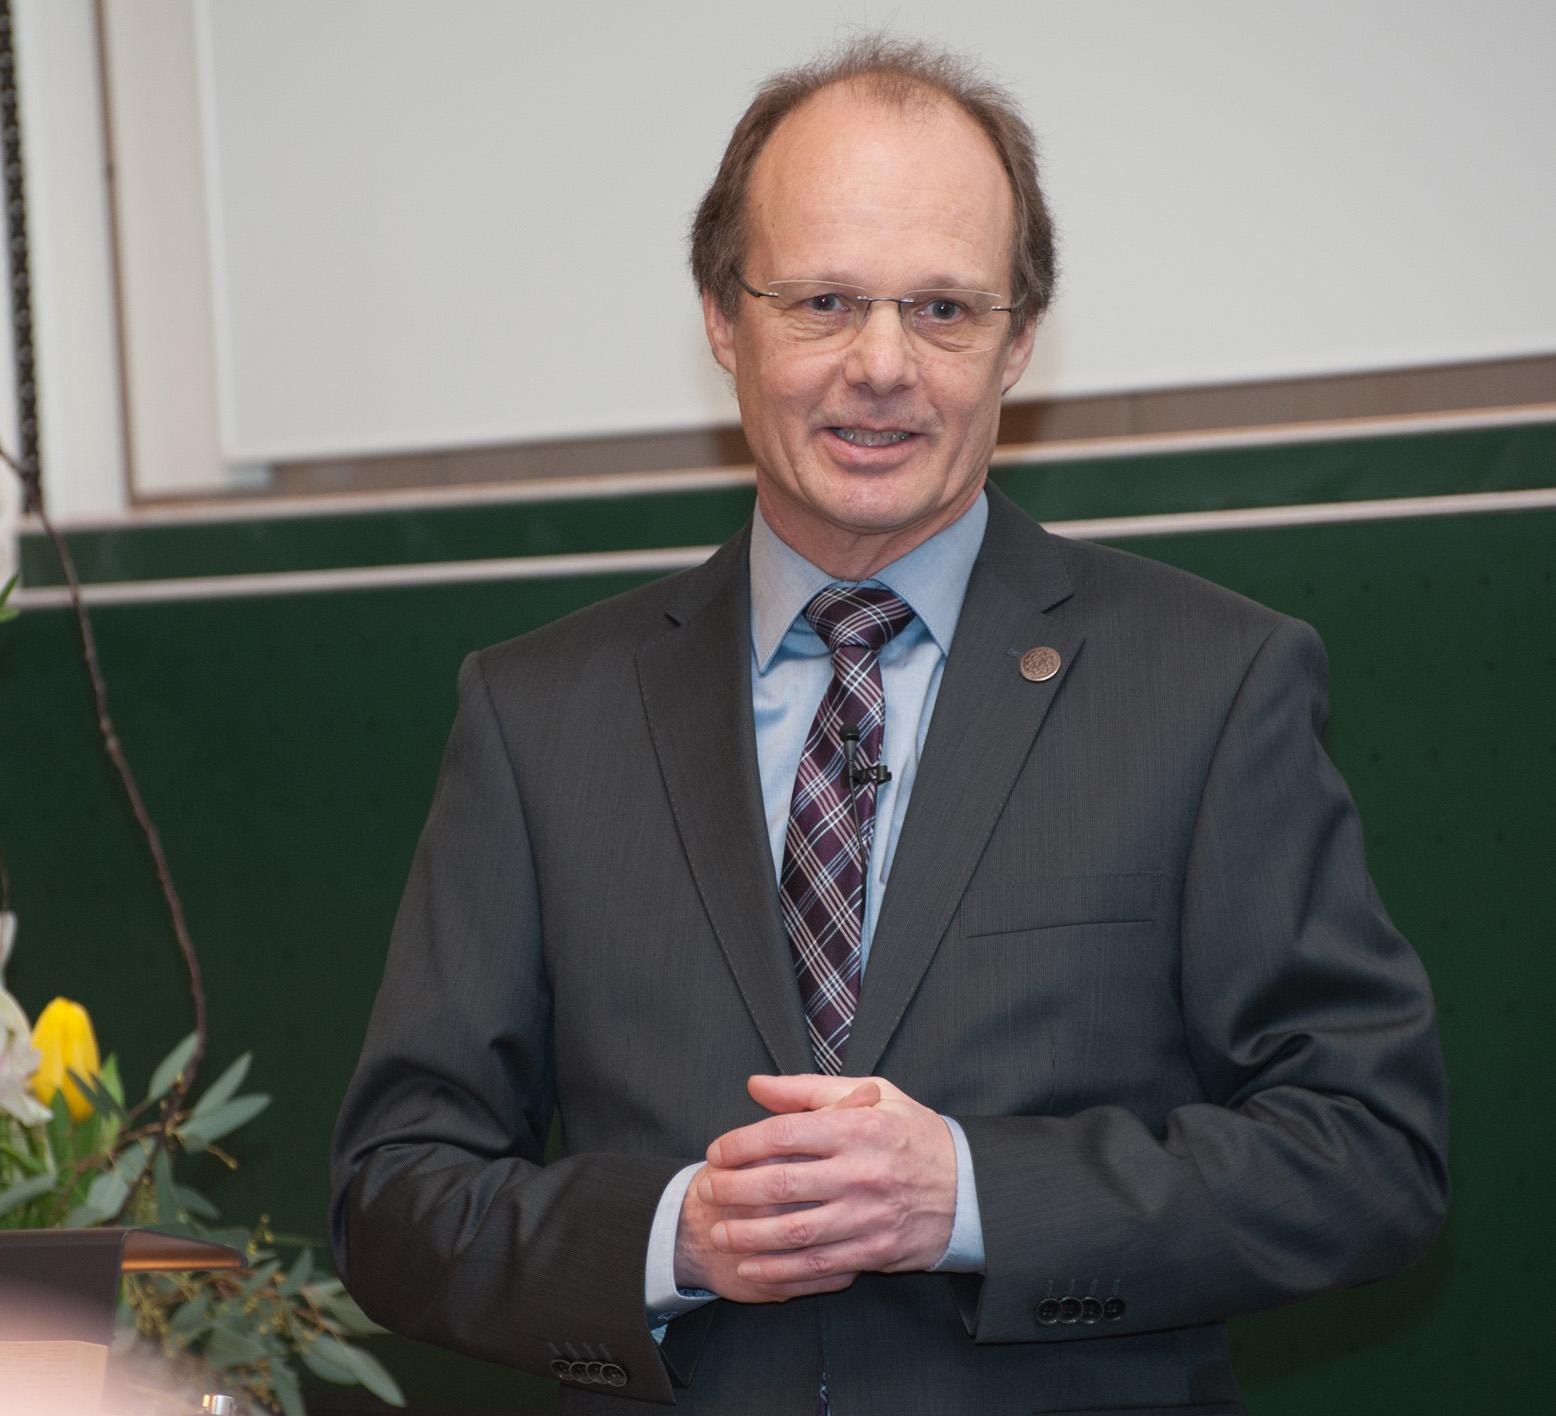 Dies academicus 2016 - Universität Ulm